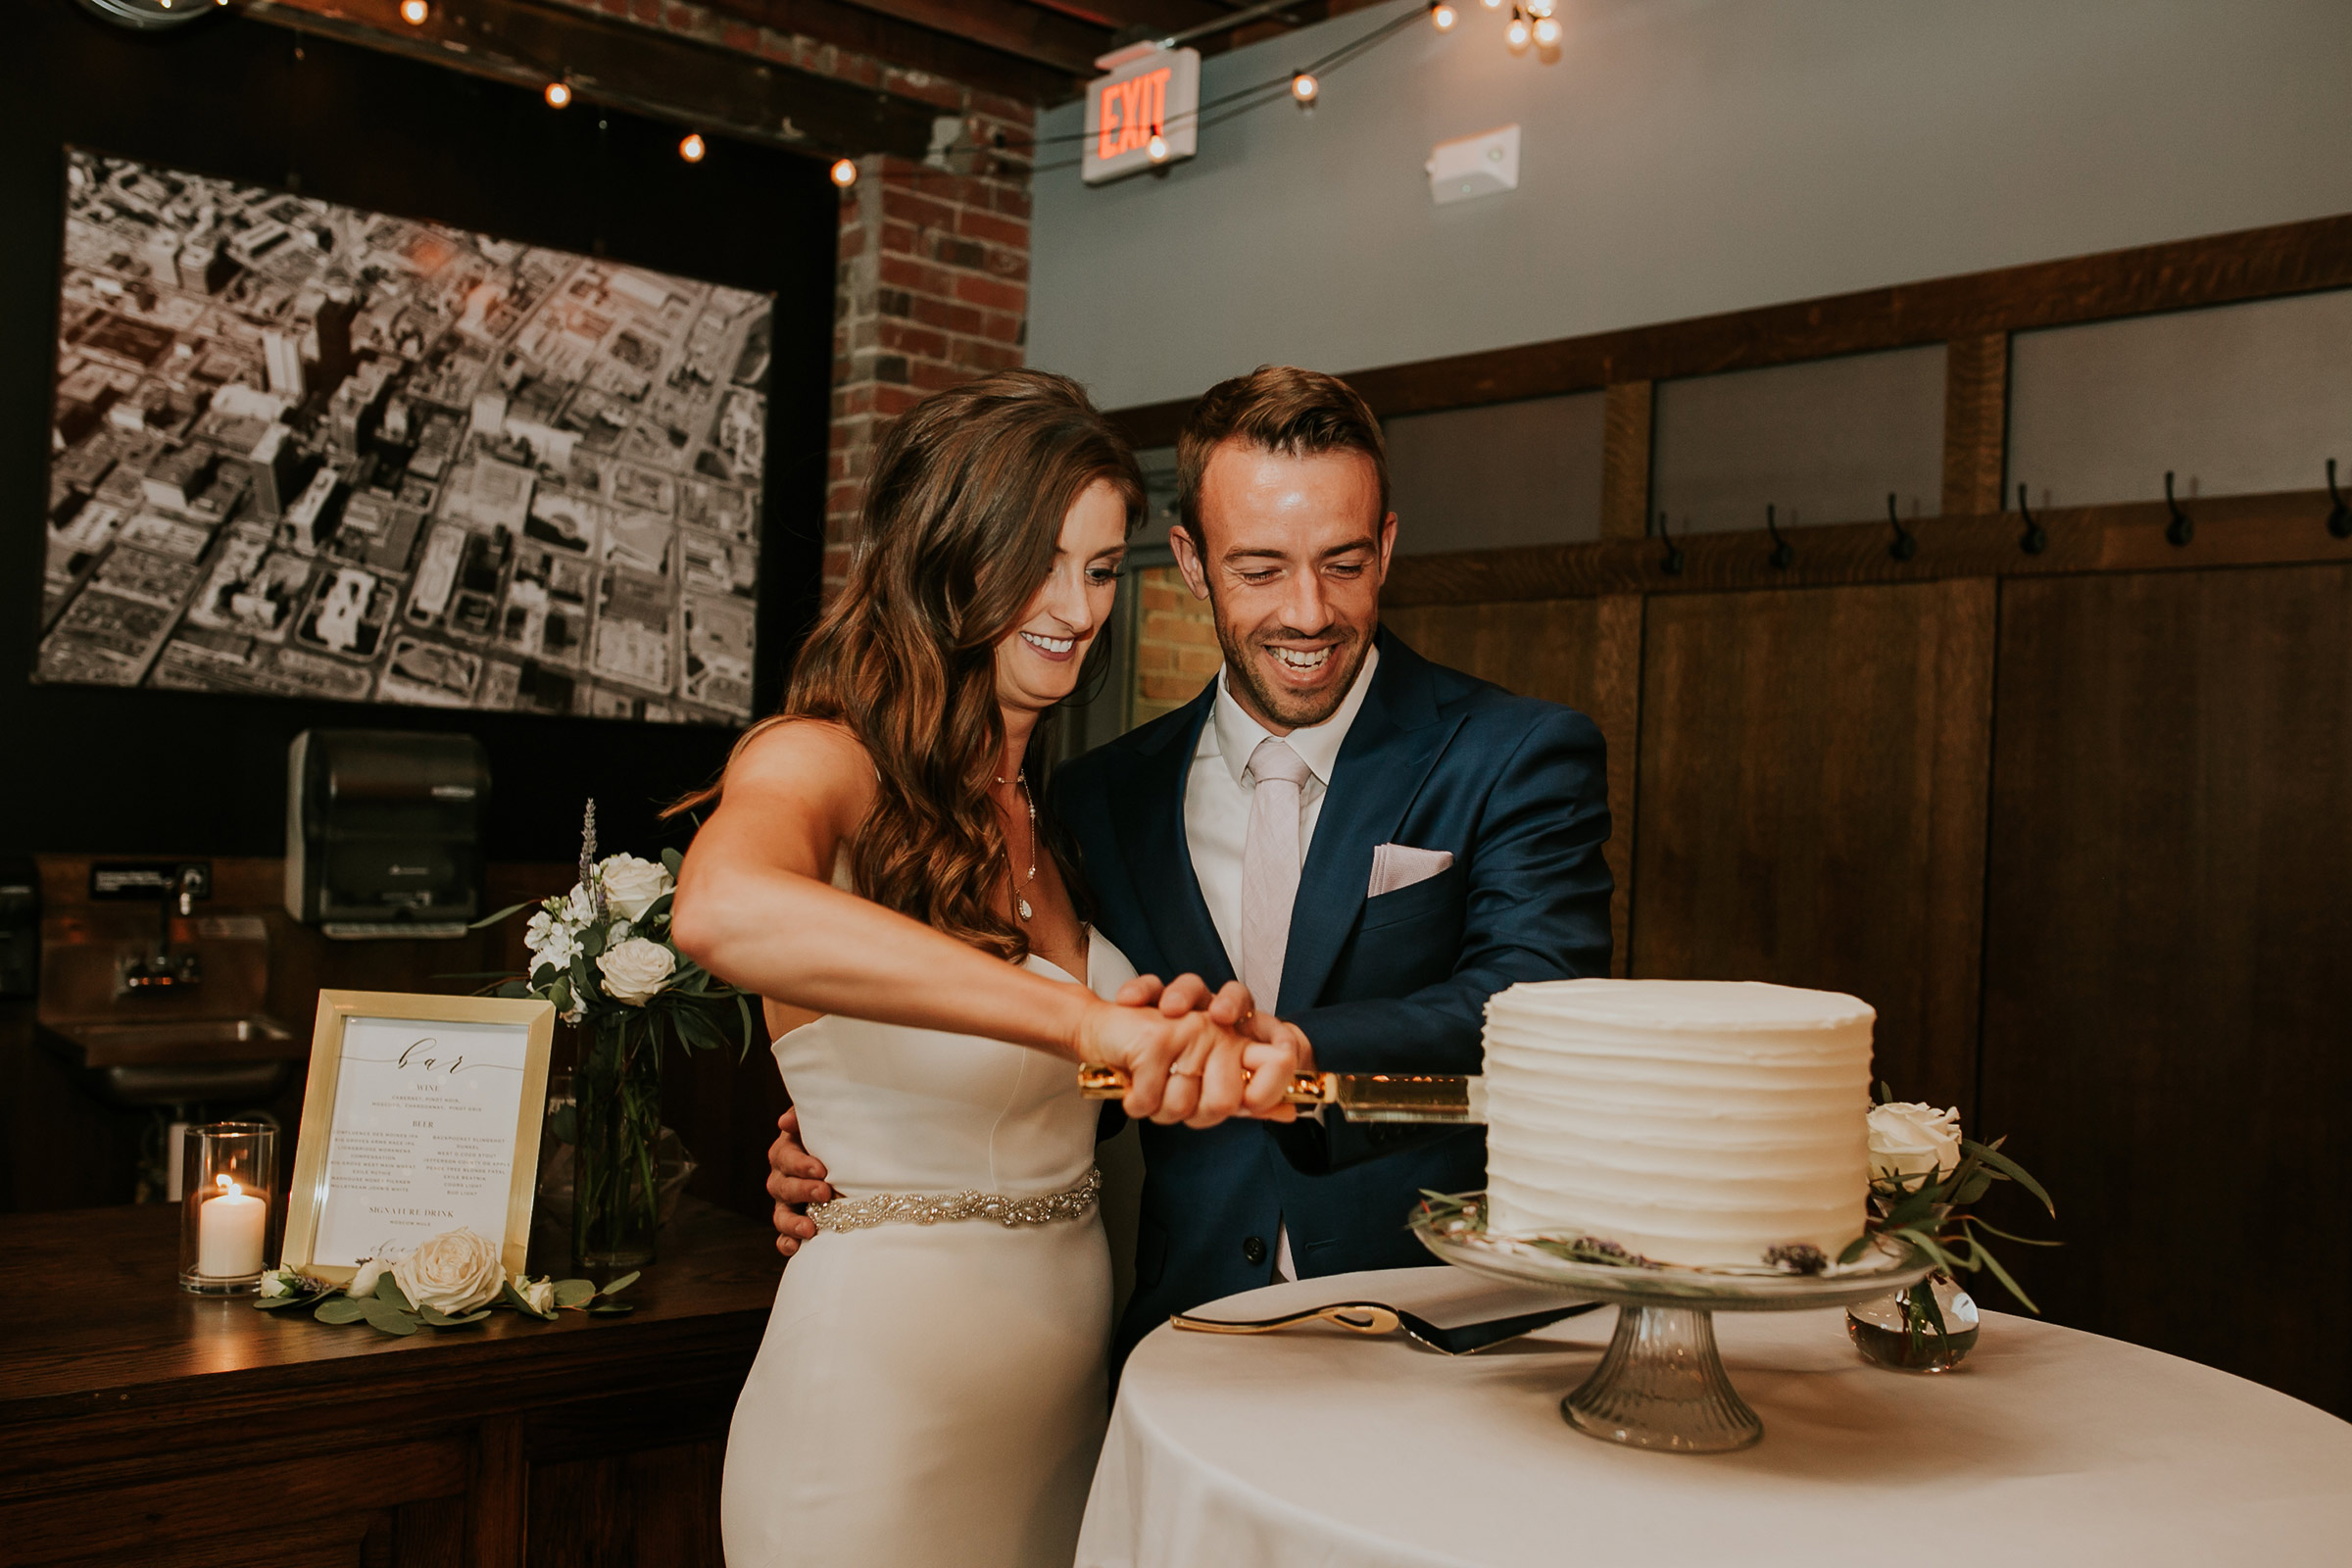 mr-mrs-hull-couple-cutting-cake-taproom-desmoines-iowa-raelyn-ramey-photography-551.jpg